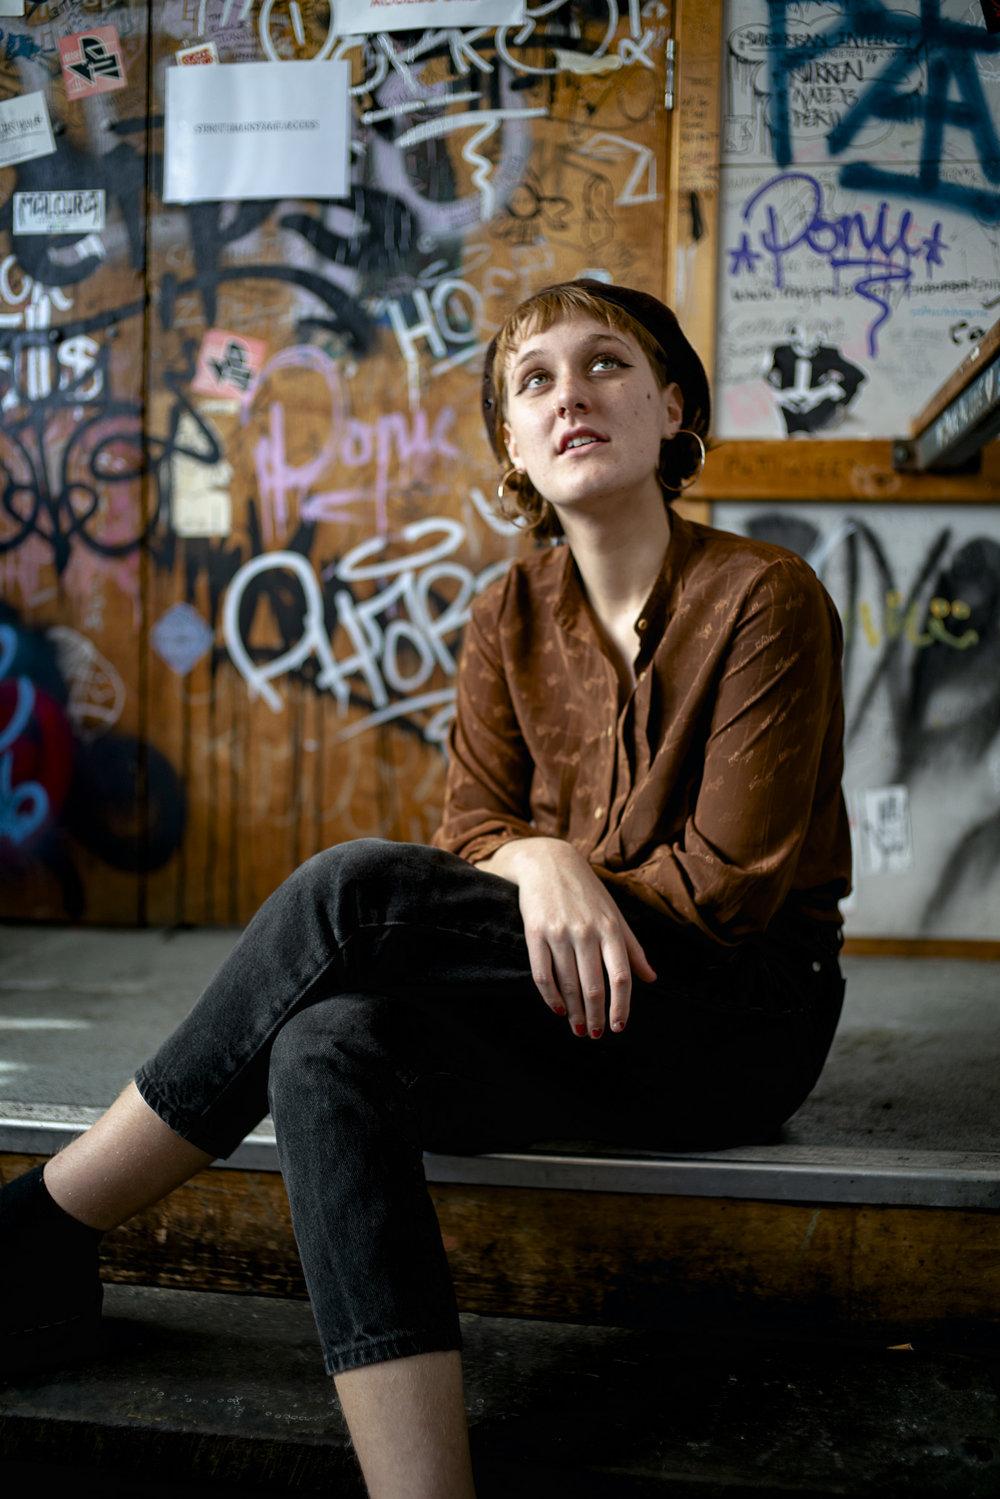 'Carla Geneve' Portrait by Hugo Sharp, 2018